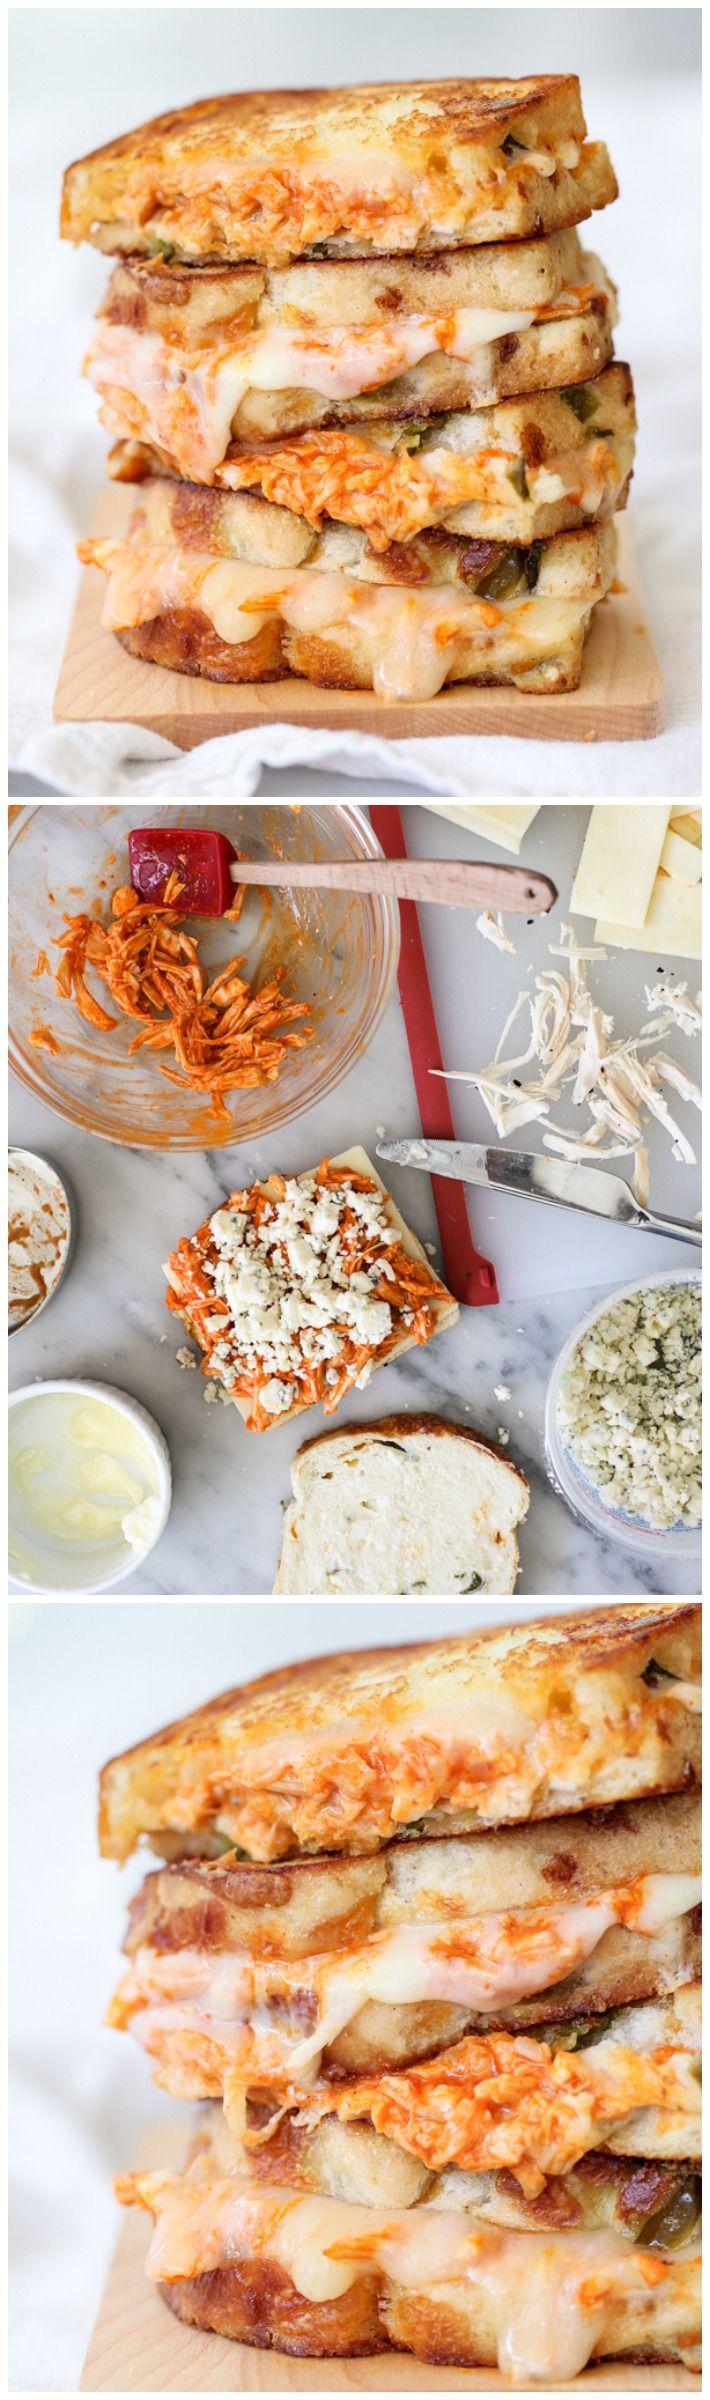 Buffalo Chicken Grilled Cheese Sandwich | foodiecrush.com #recipe